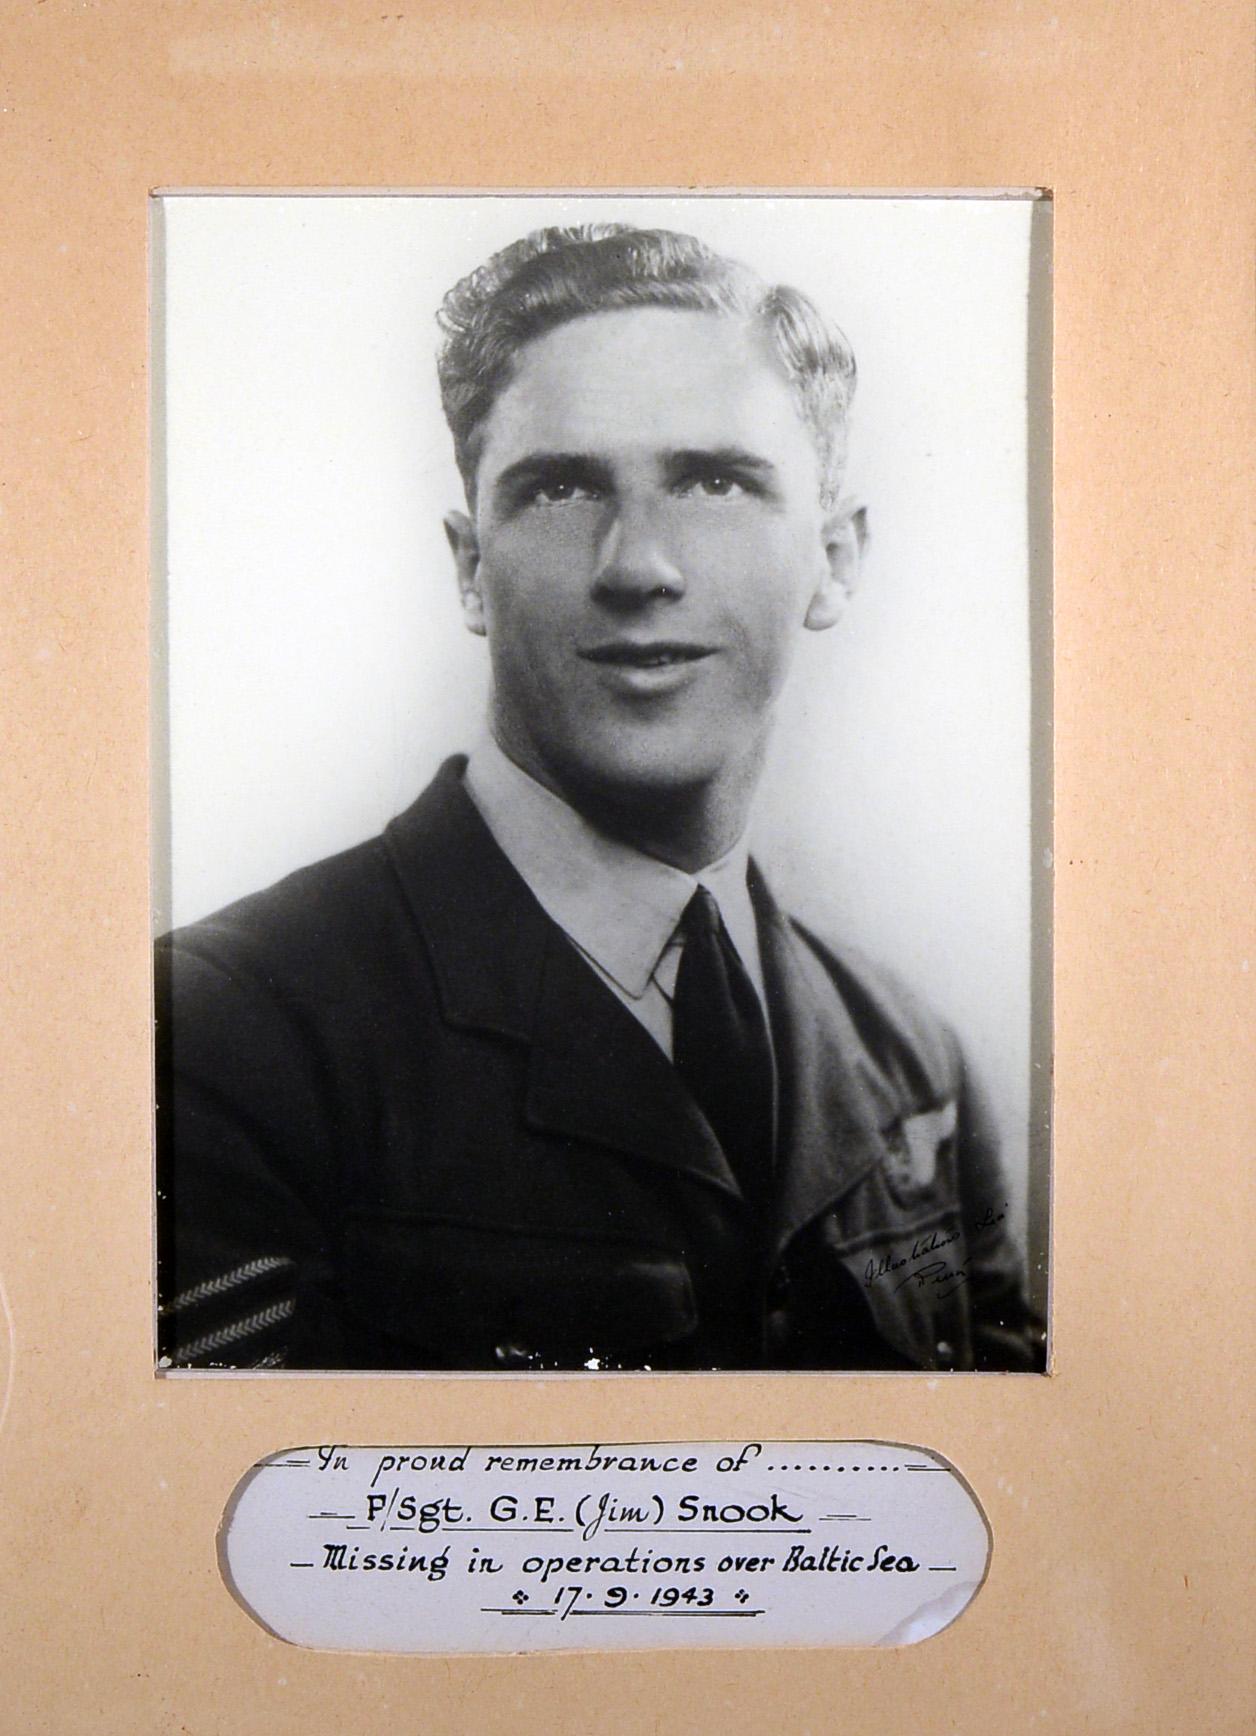 148. Sgt Jim Snook, 1943